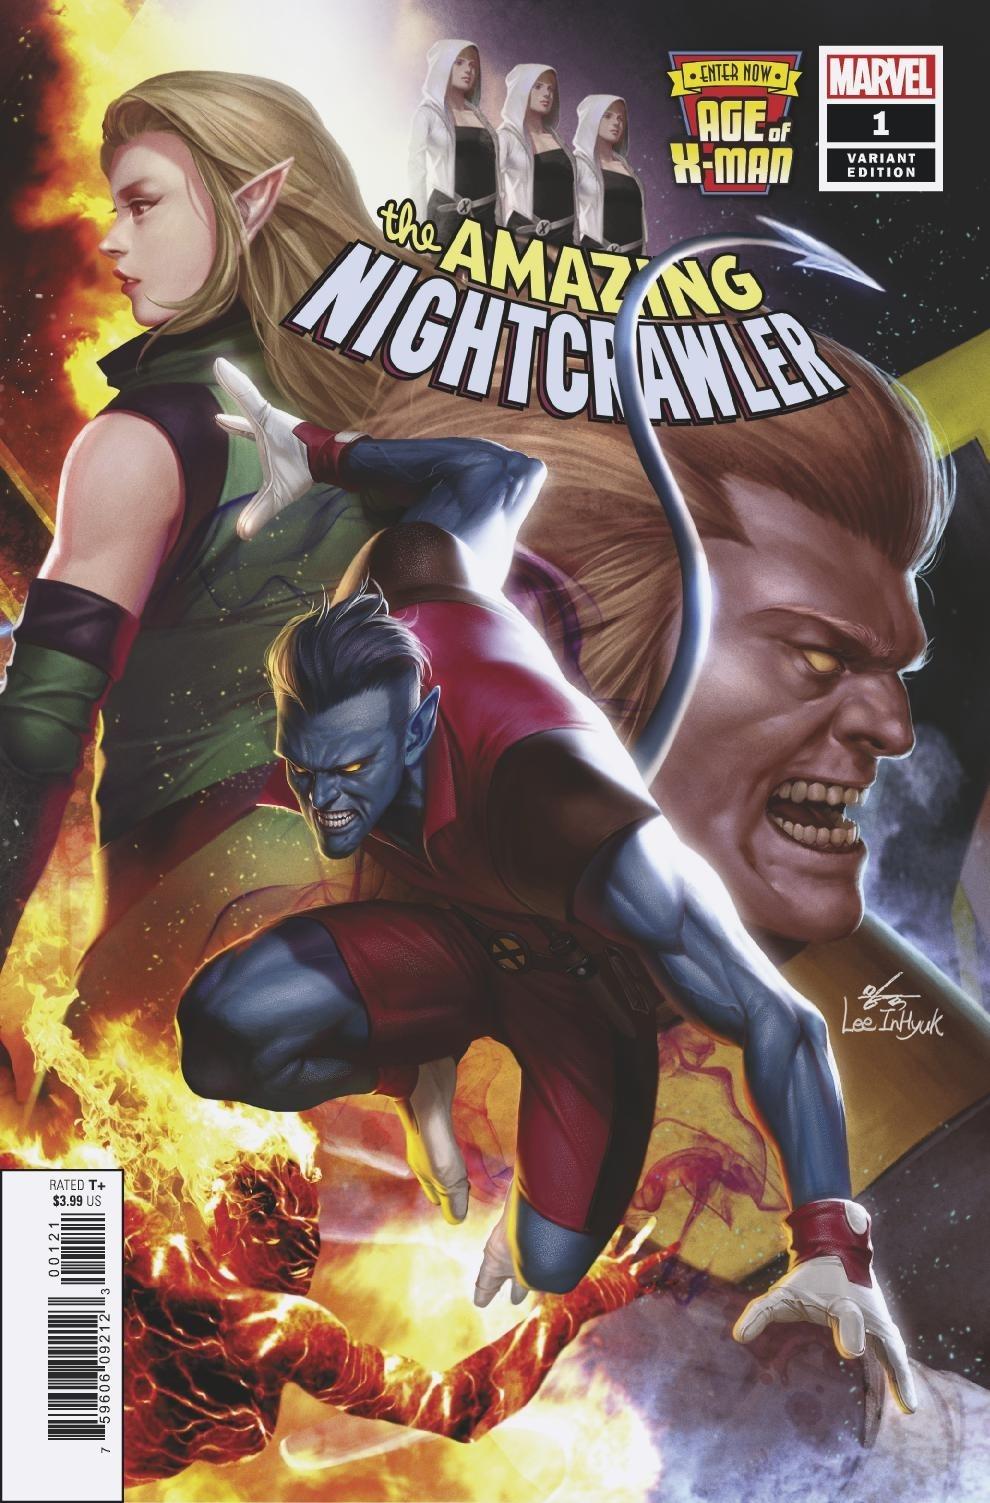 Age of X-Man The Amazing Nightcrawler Vol 1 1 Lee Connecting Variant.jpg